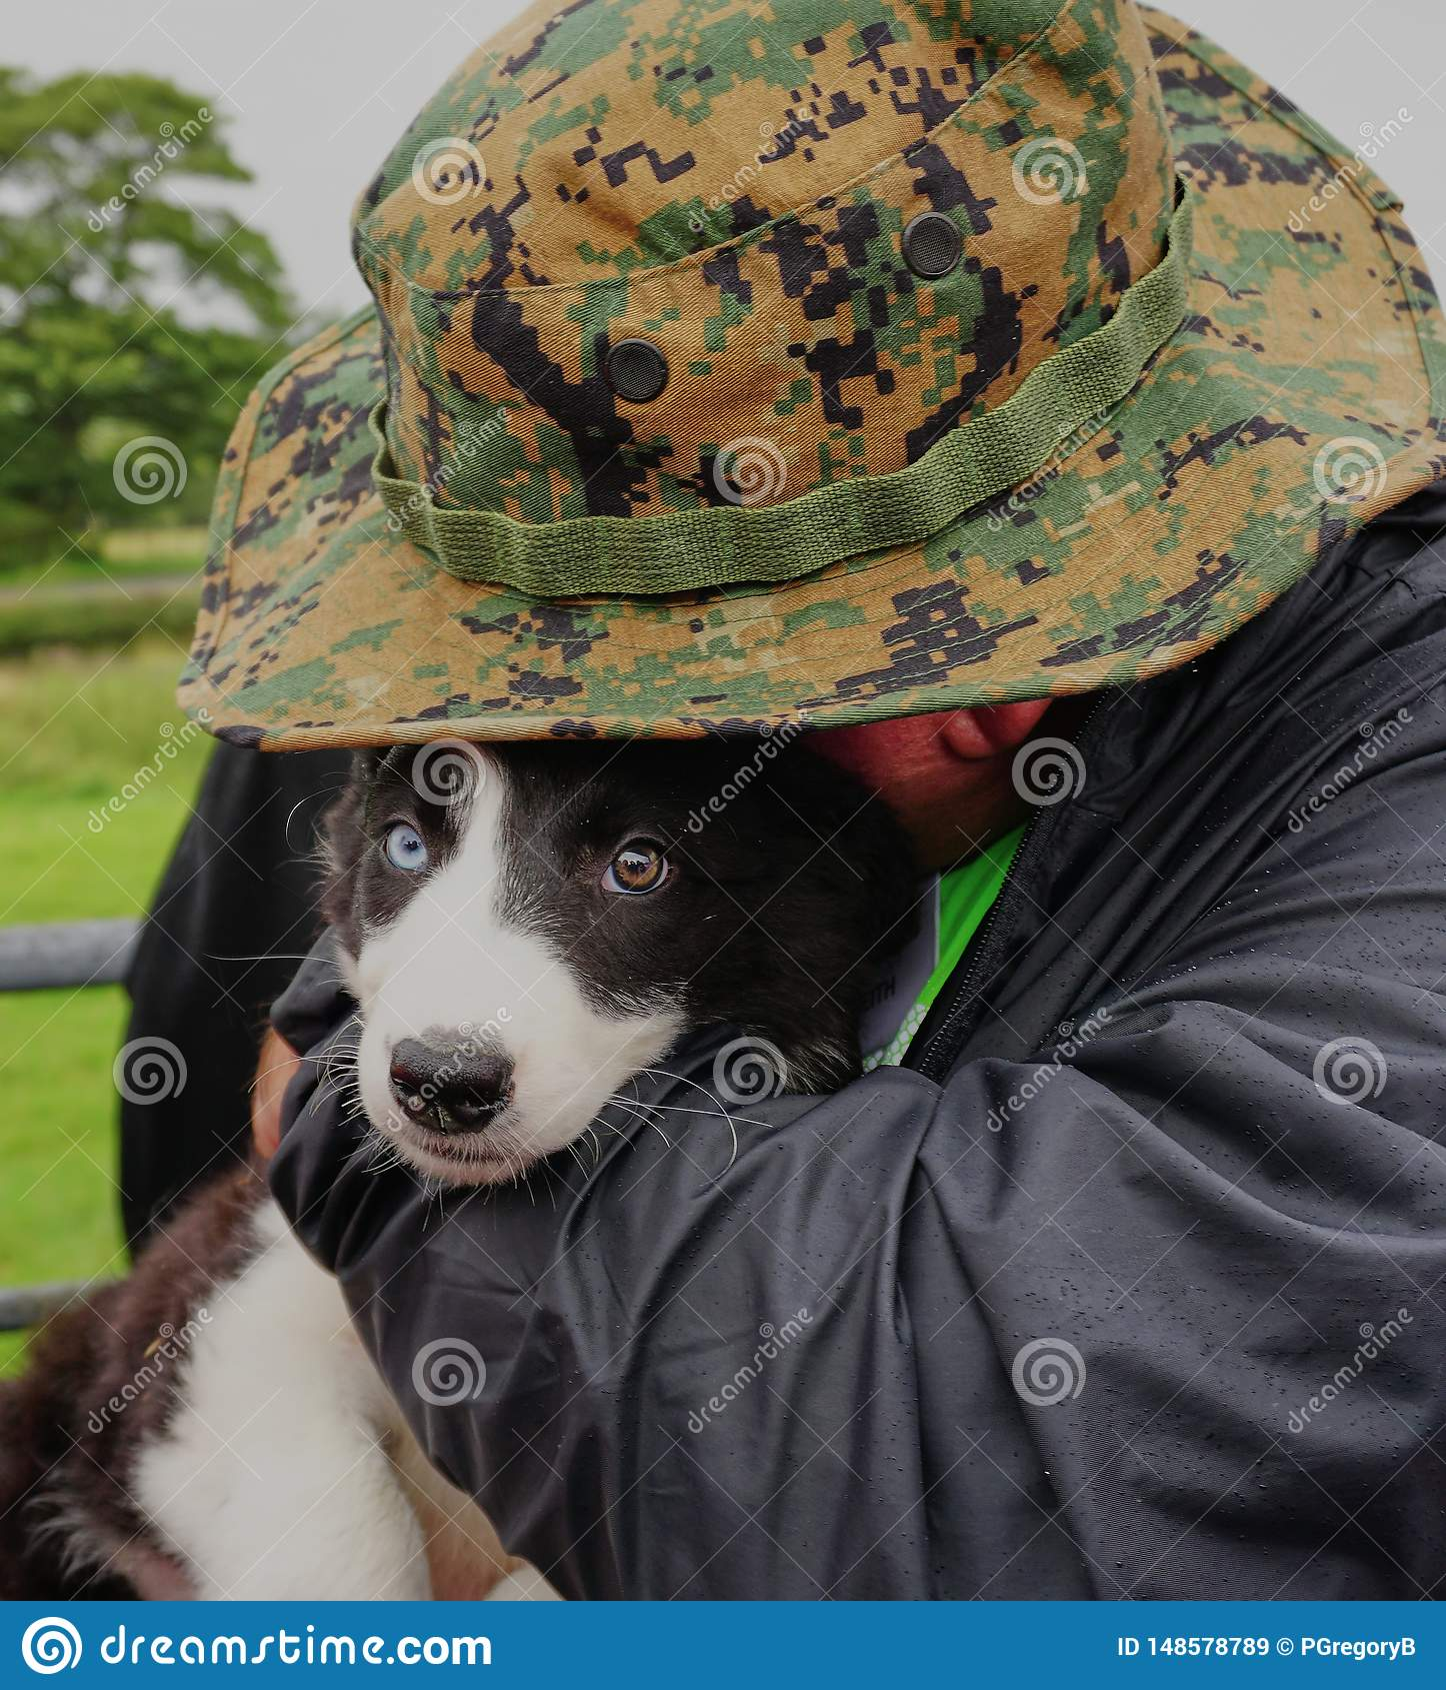 Animal Lover Hugs Beautiful Sheep Dog Puppy - Wales UK.